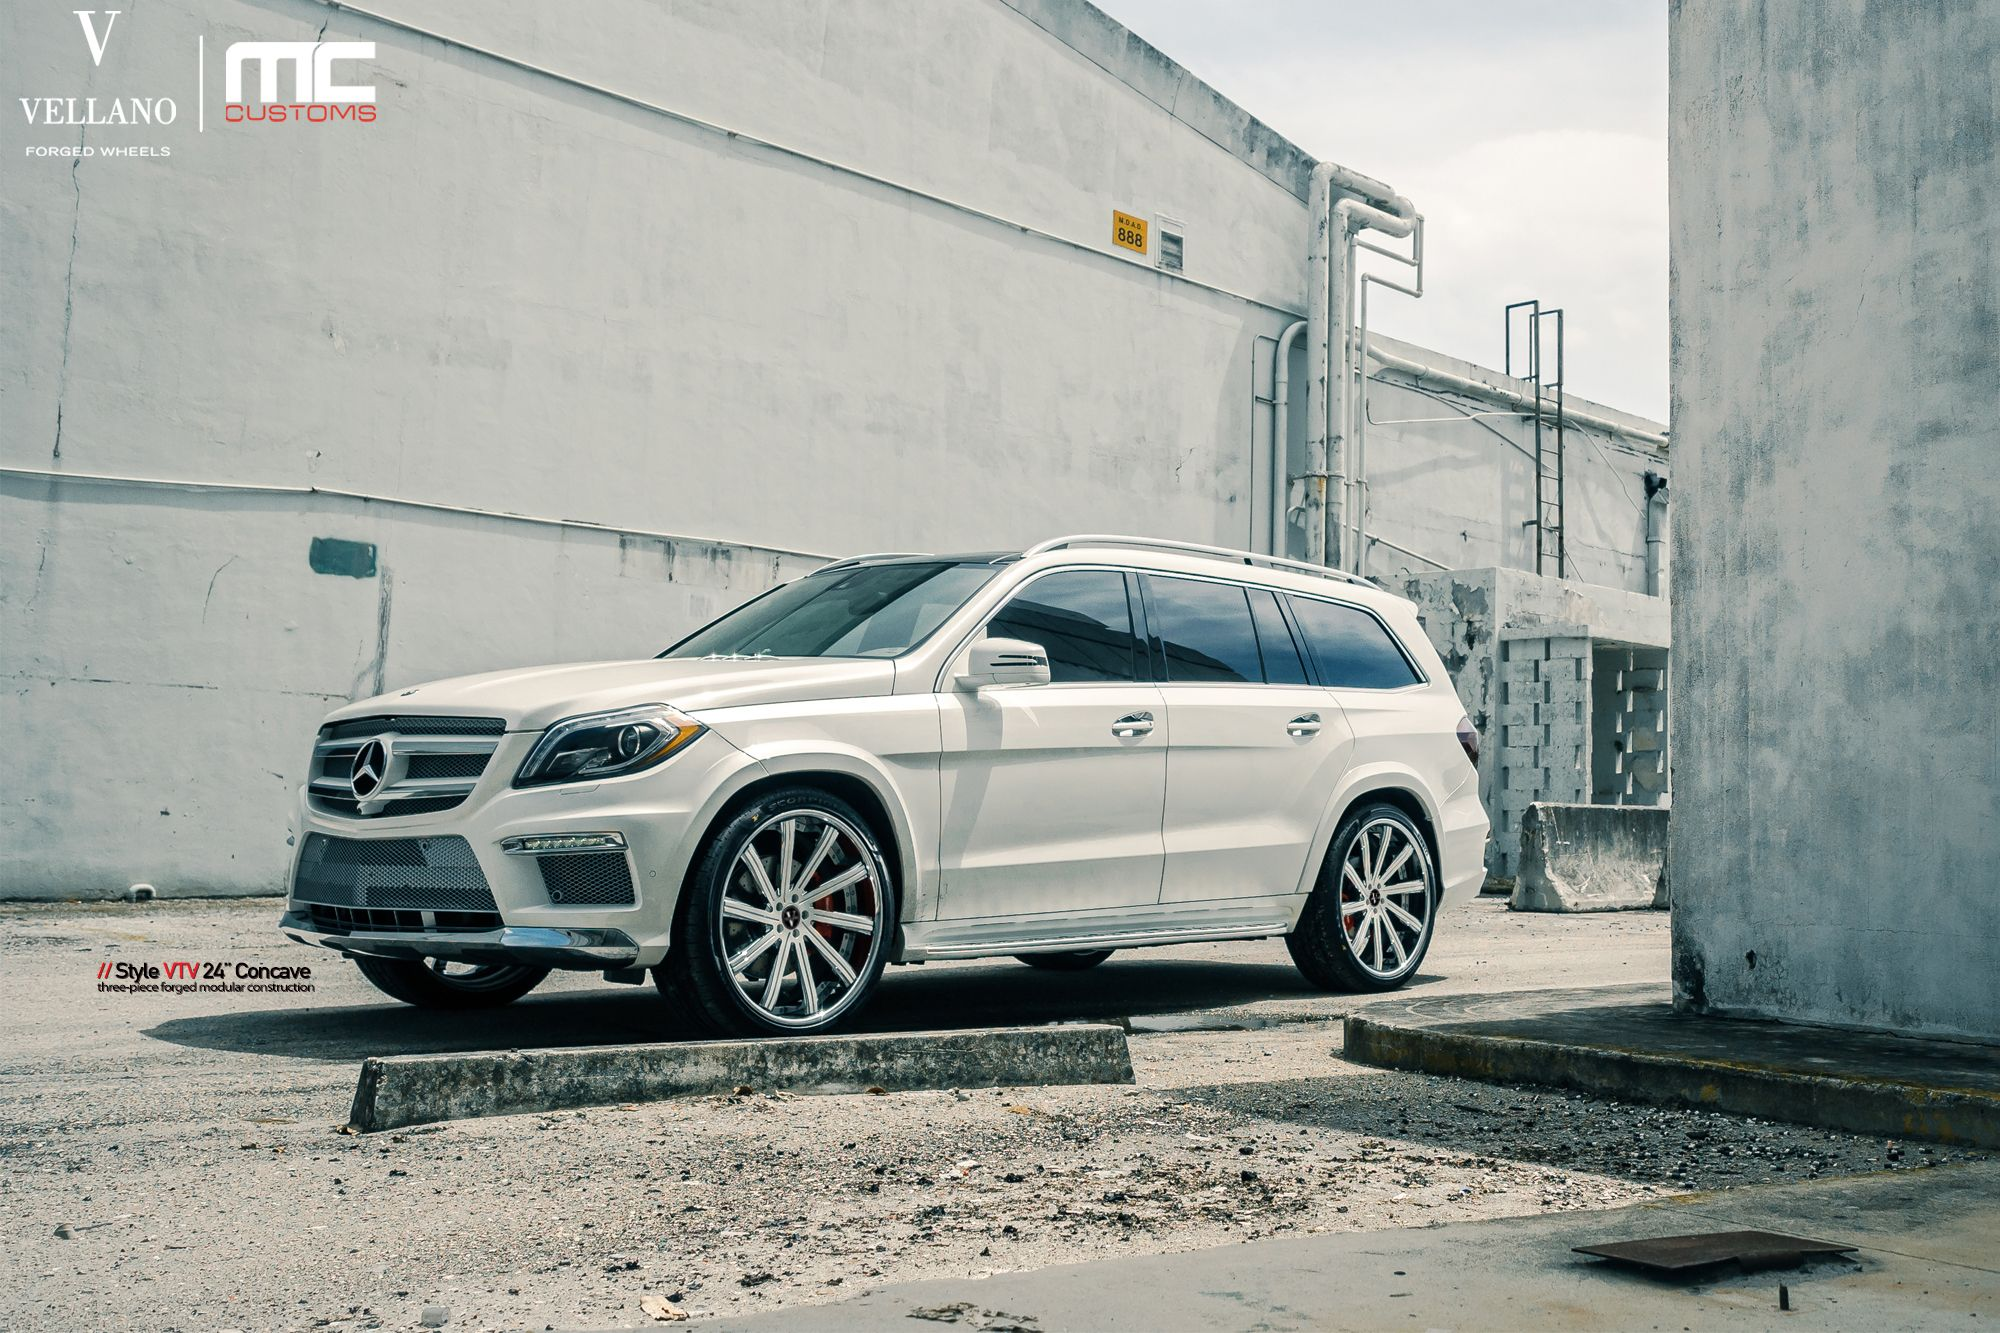 Mercedes Benz GL550 rolling on a set of Vellano VTV 24 ...